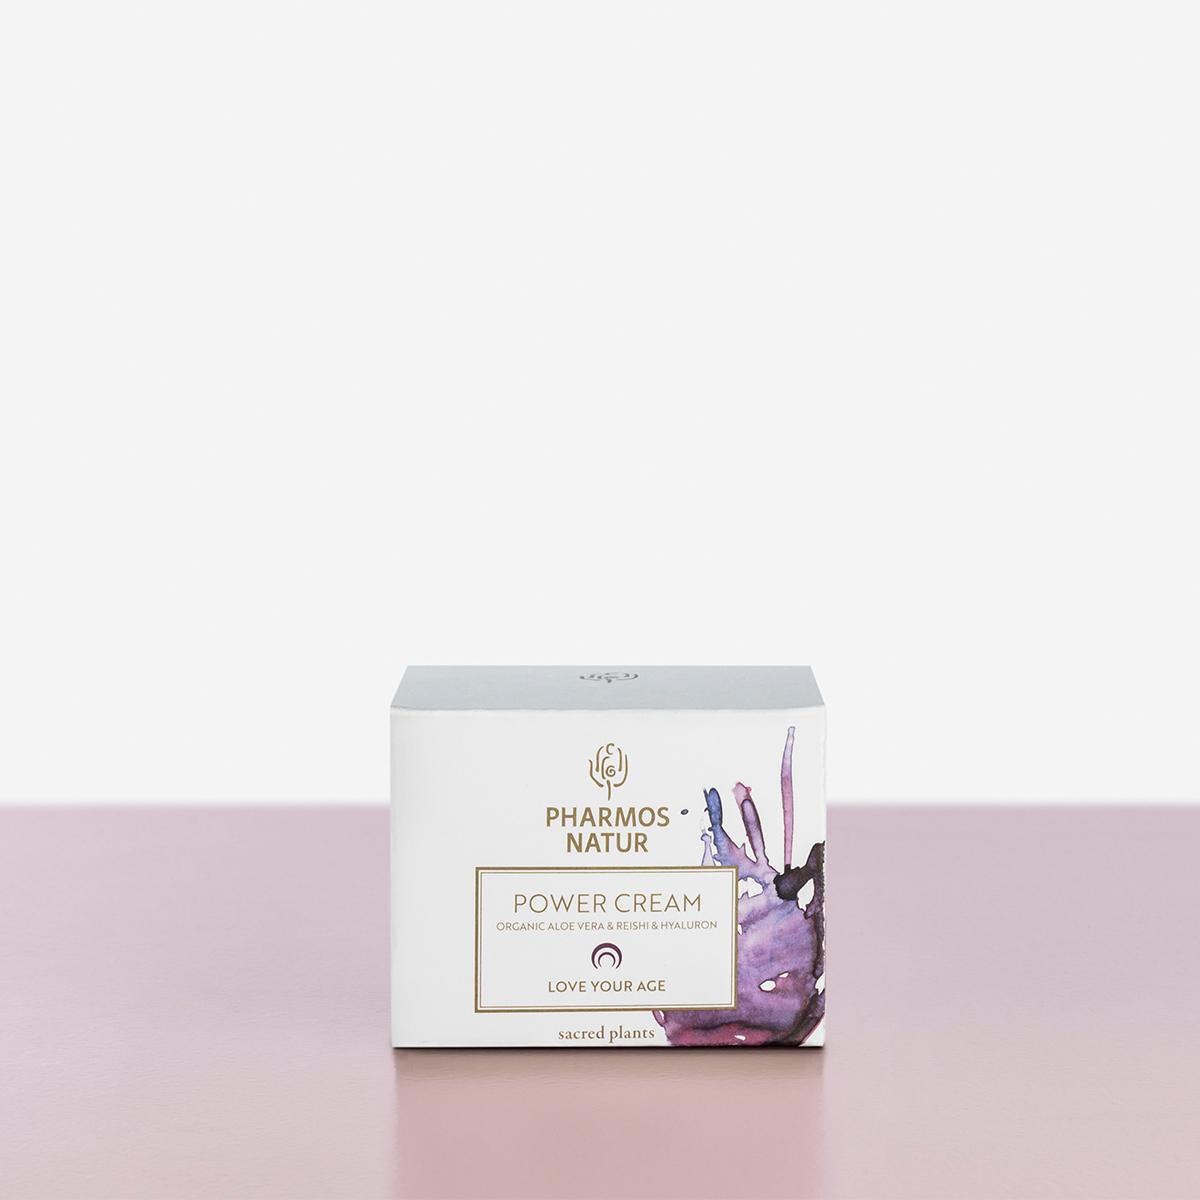 Verpackung Love your age Power Cream Produktbild